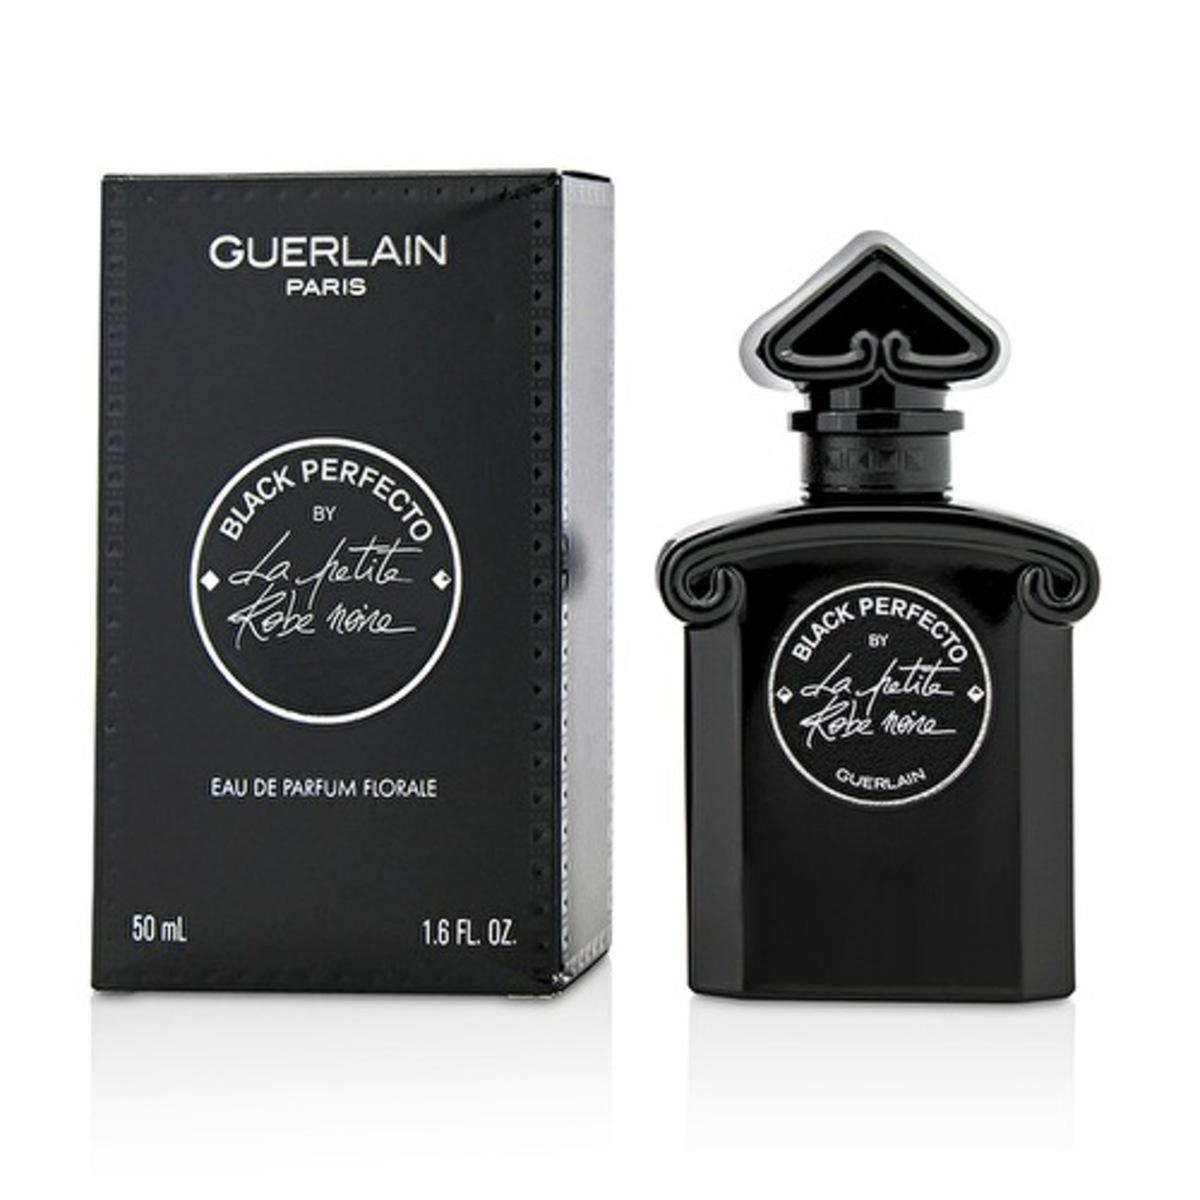 Petite Robe Noire Black Perfecto Edition EDP 50ml [Parallel Import]